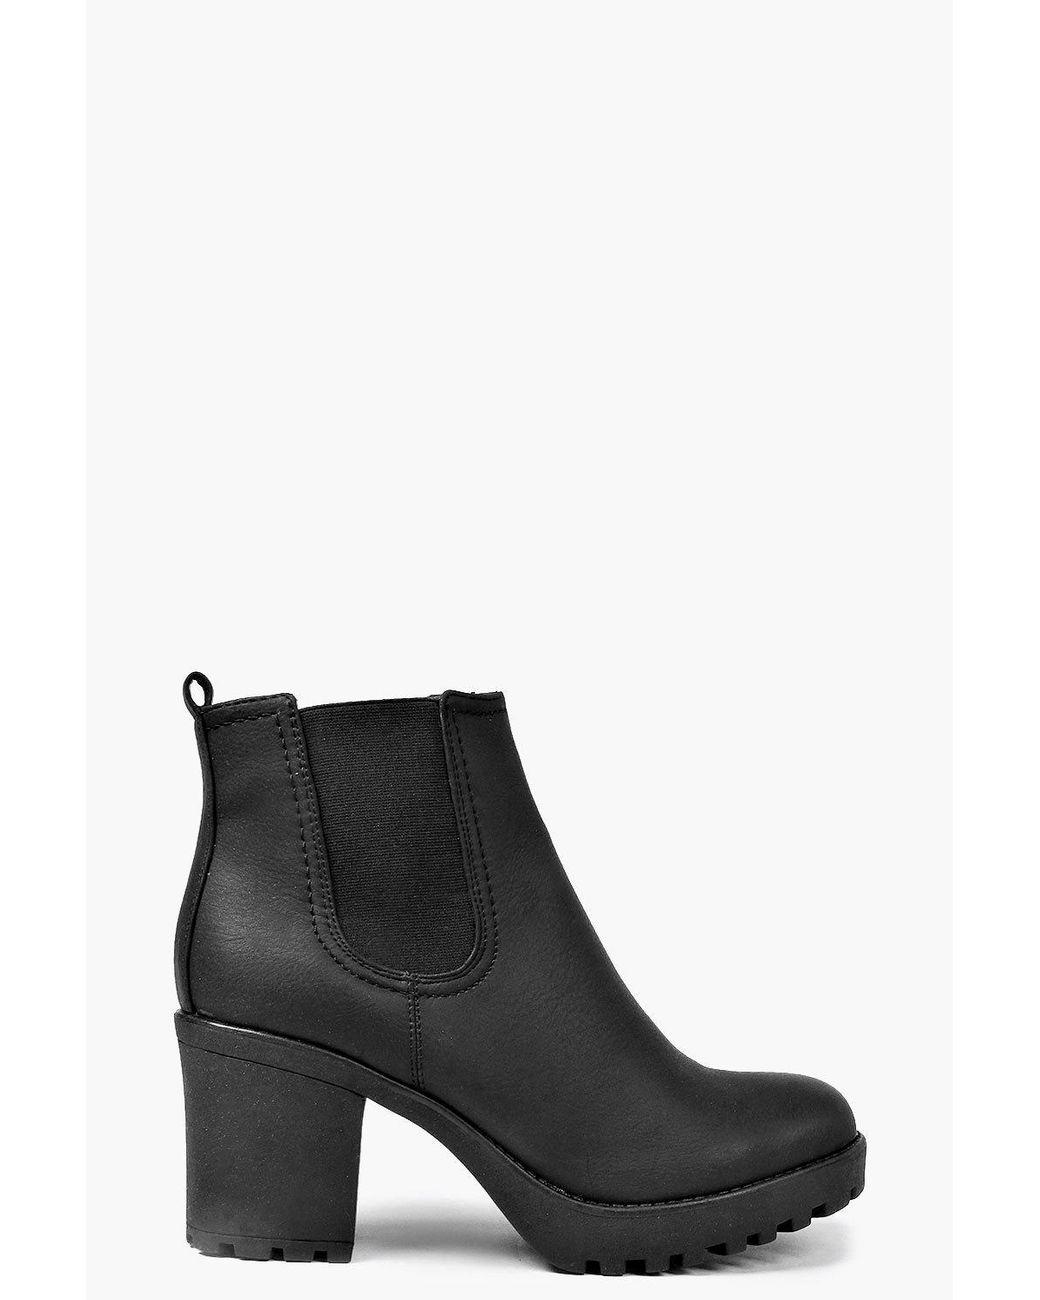 Tia Chunky Cleated Heel Chelsea Boot